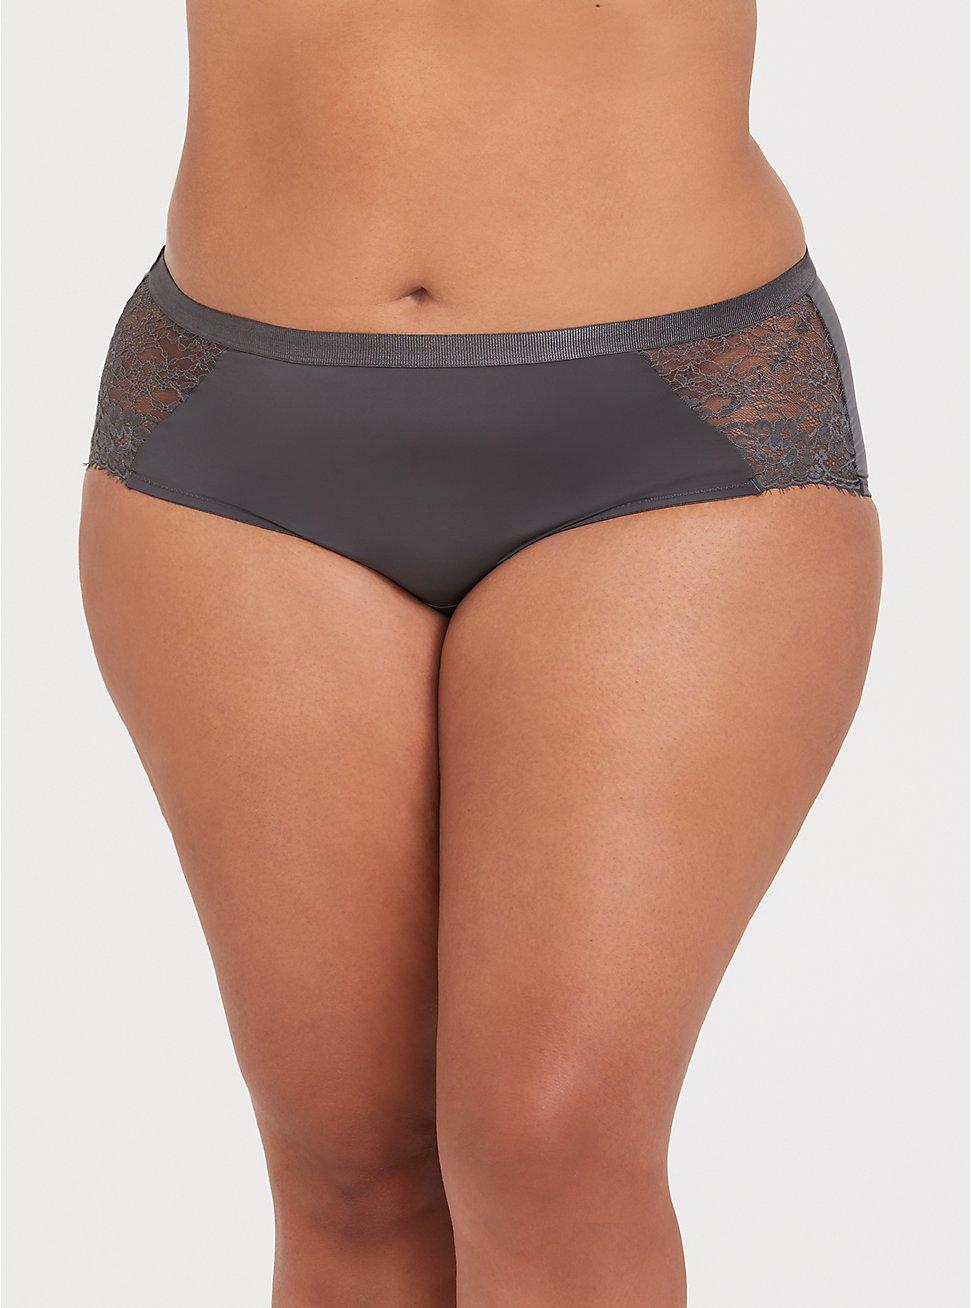 Dark Grey Microfiber & Lace Cheeky Panty, MAGNET, hi-res